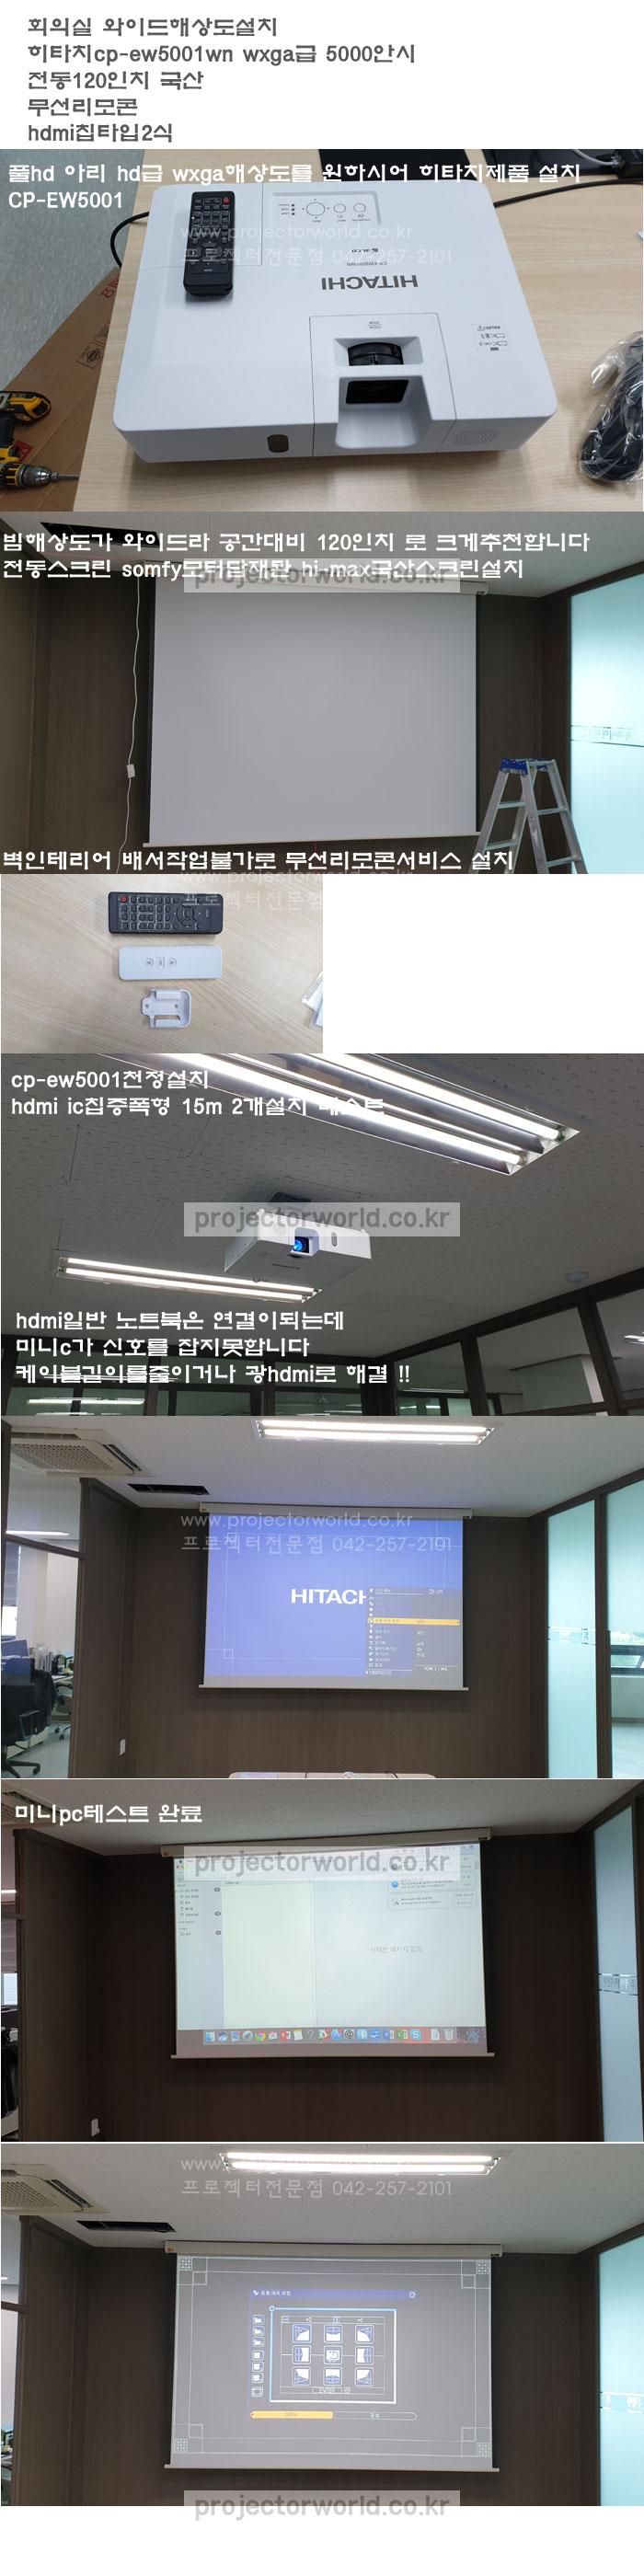 cp-ew5001,대전회의실빔설치,와이드프로젝터,대전스크린설치,somfy스크린무선,대전광hdmi,4k-hdmi,